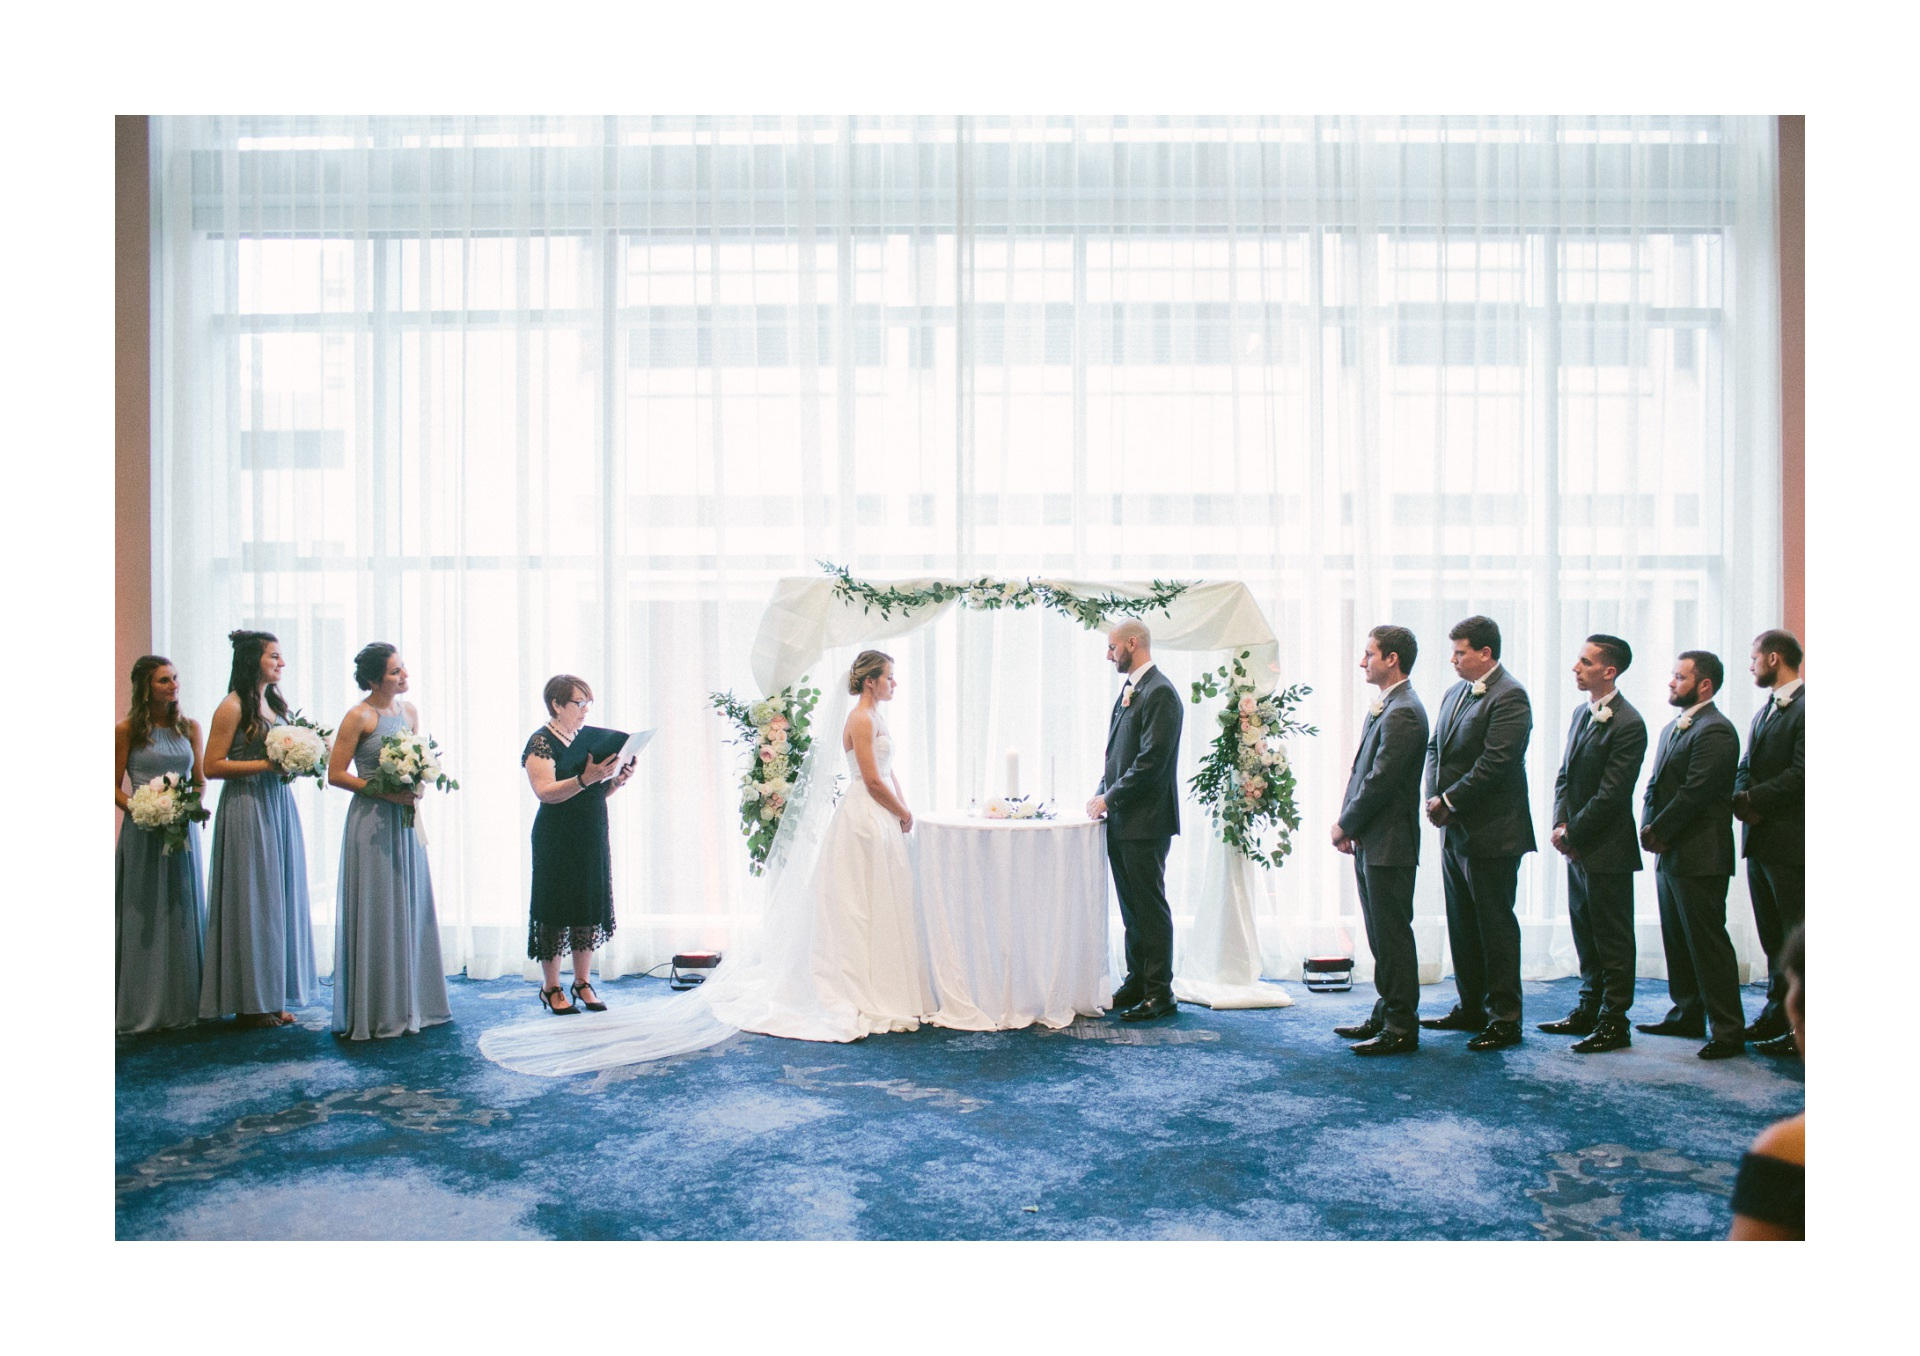 Dowtown Hilton Cleveland Wedding Photographer 2 14.jpg